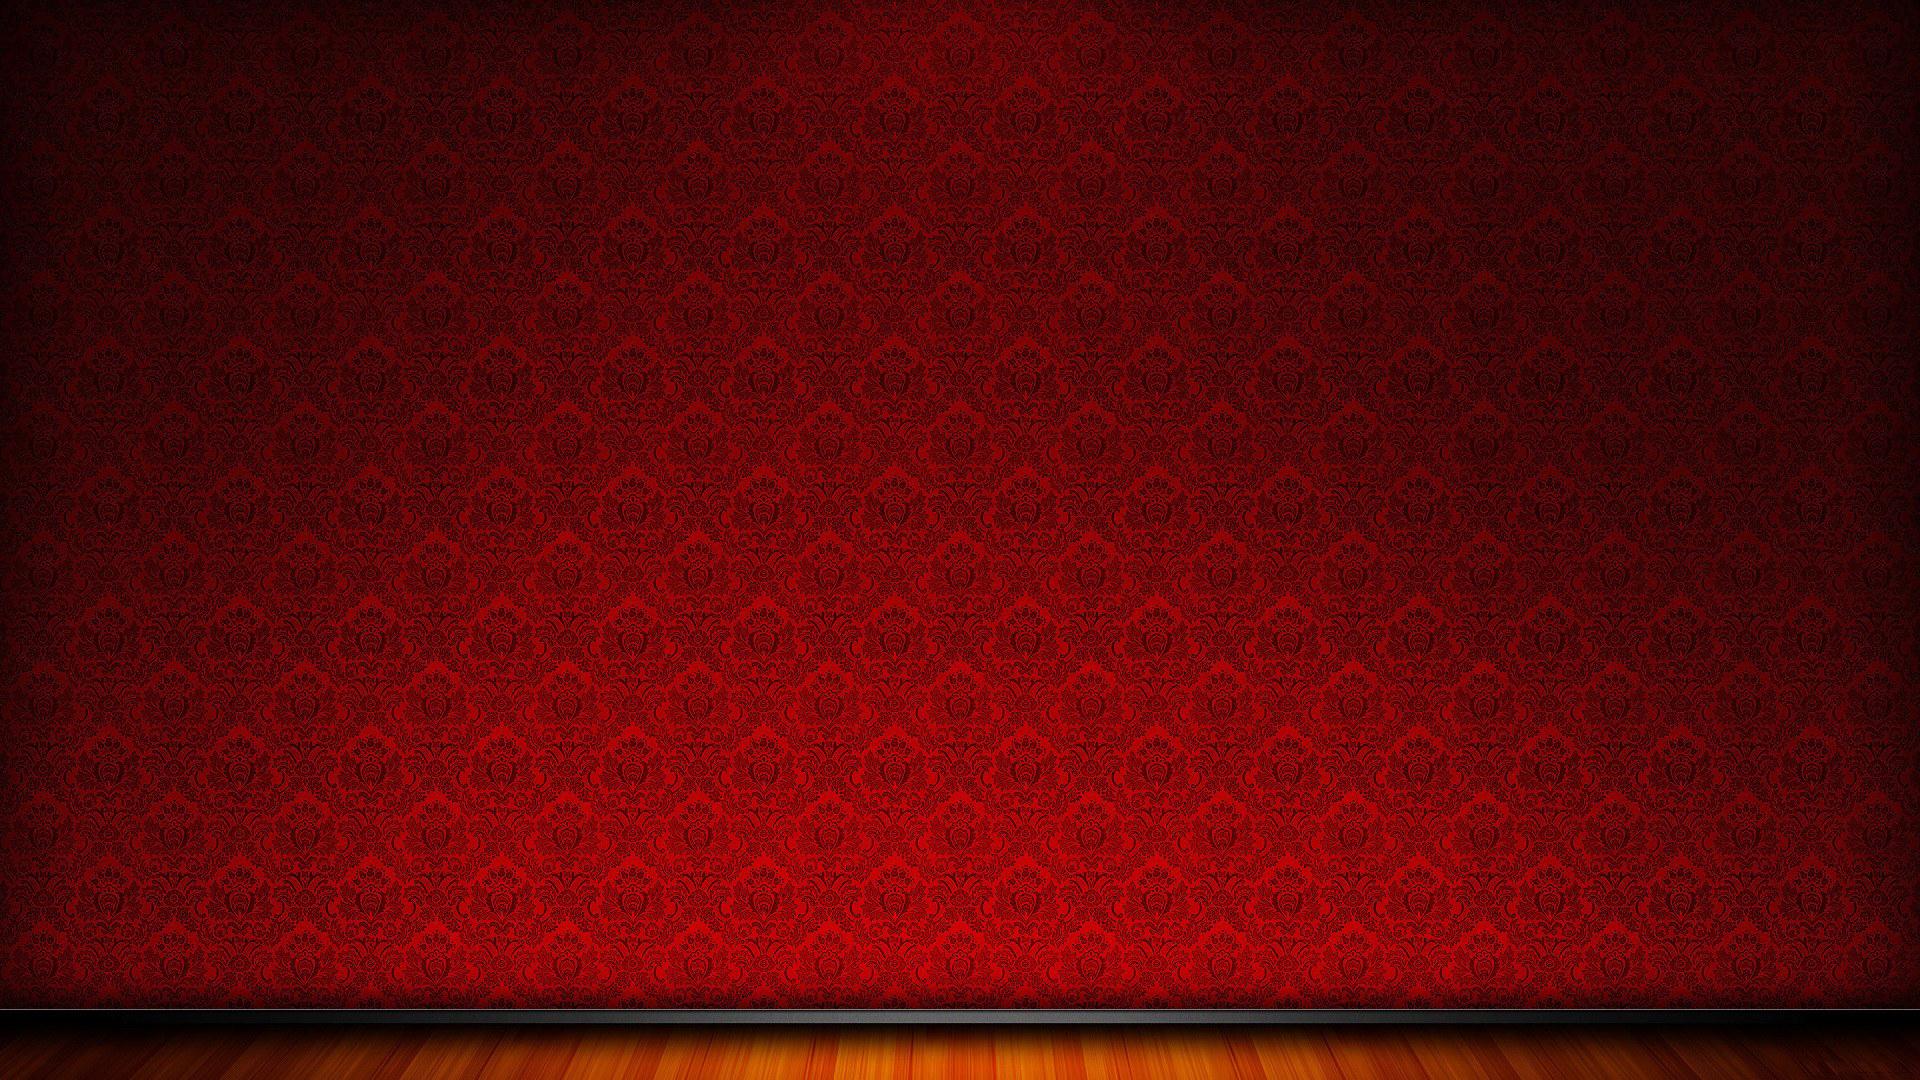 Full Hd Wallpaper For Desktop New hd wallon 1920x1080